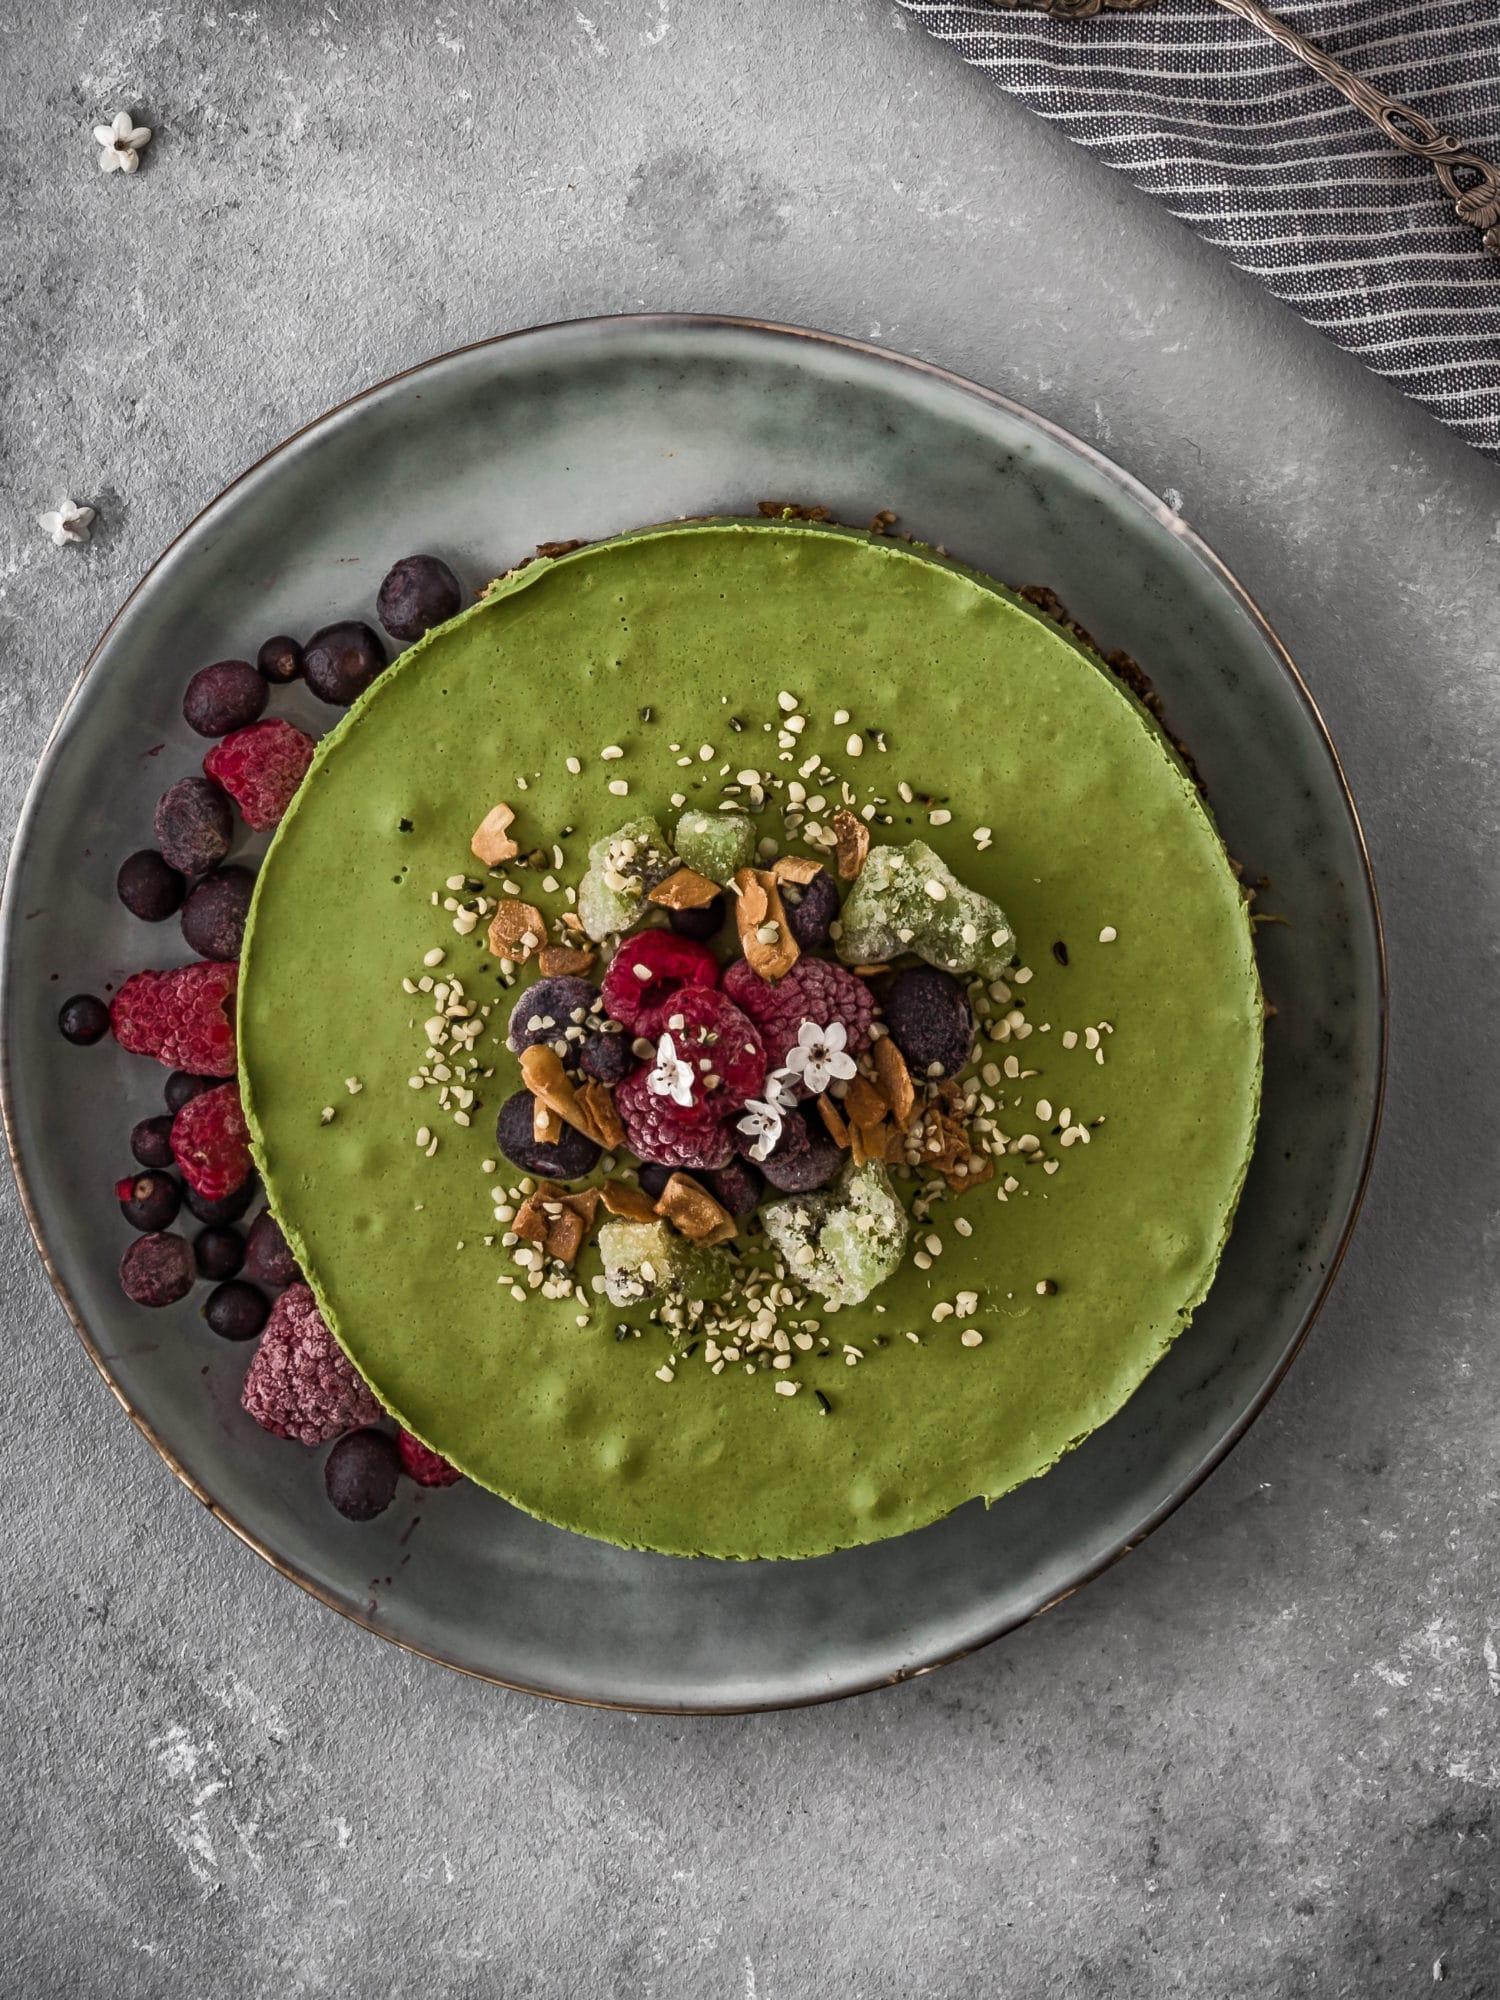 Weizengras Green Smoothie Rawcake